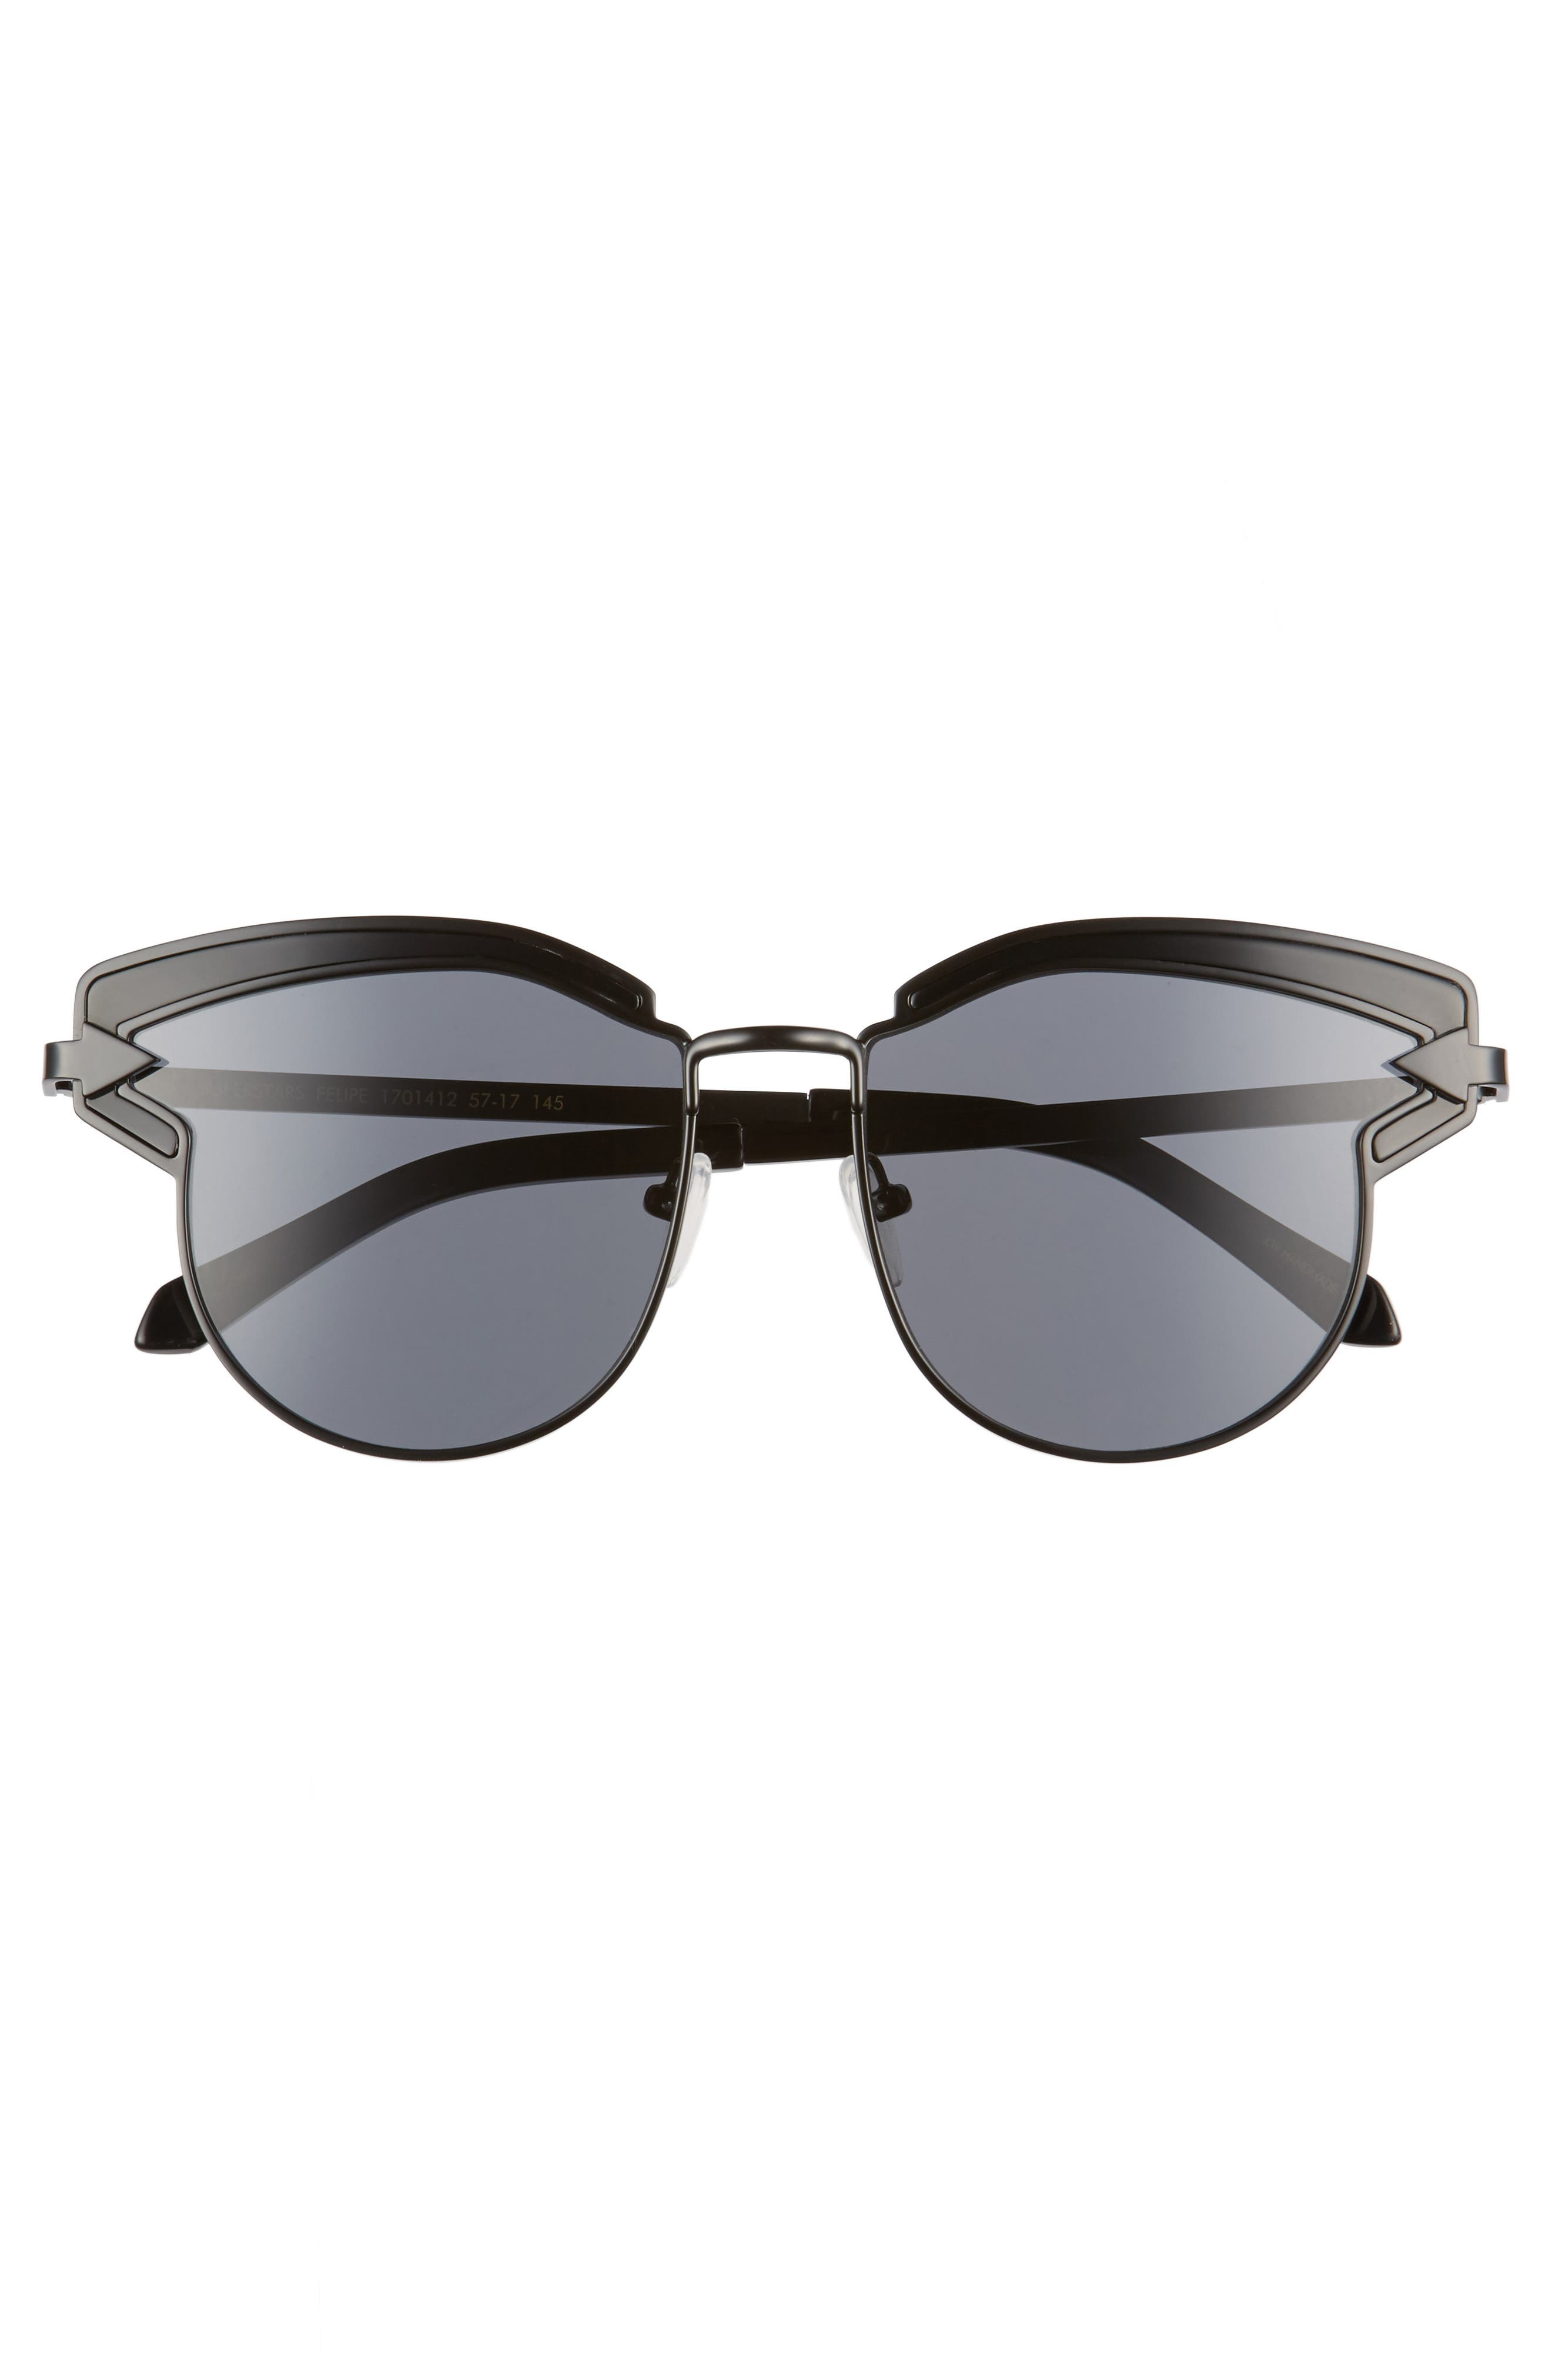 Buccaneer 47mm Round Sunglasses,                             Alternate thumbnail 7, color,